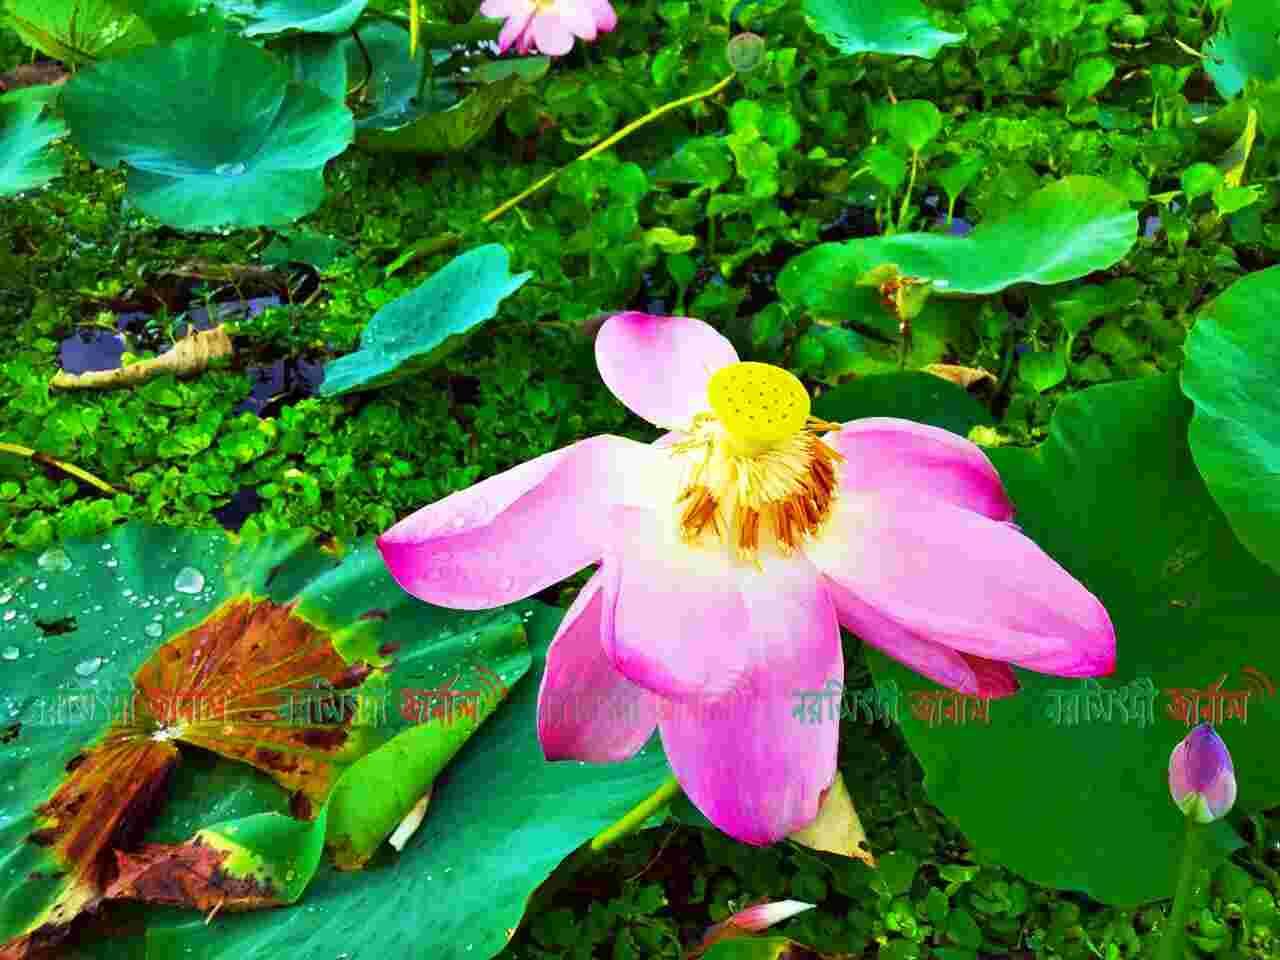 Chinadi_bil_shibpur_narsingdi_narsingdi_district_narsingdijournal